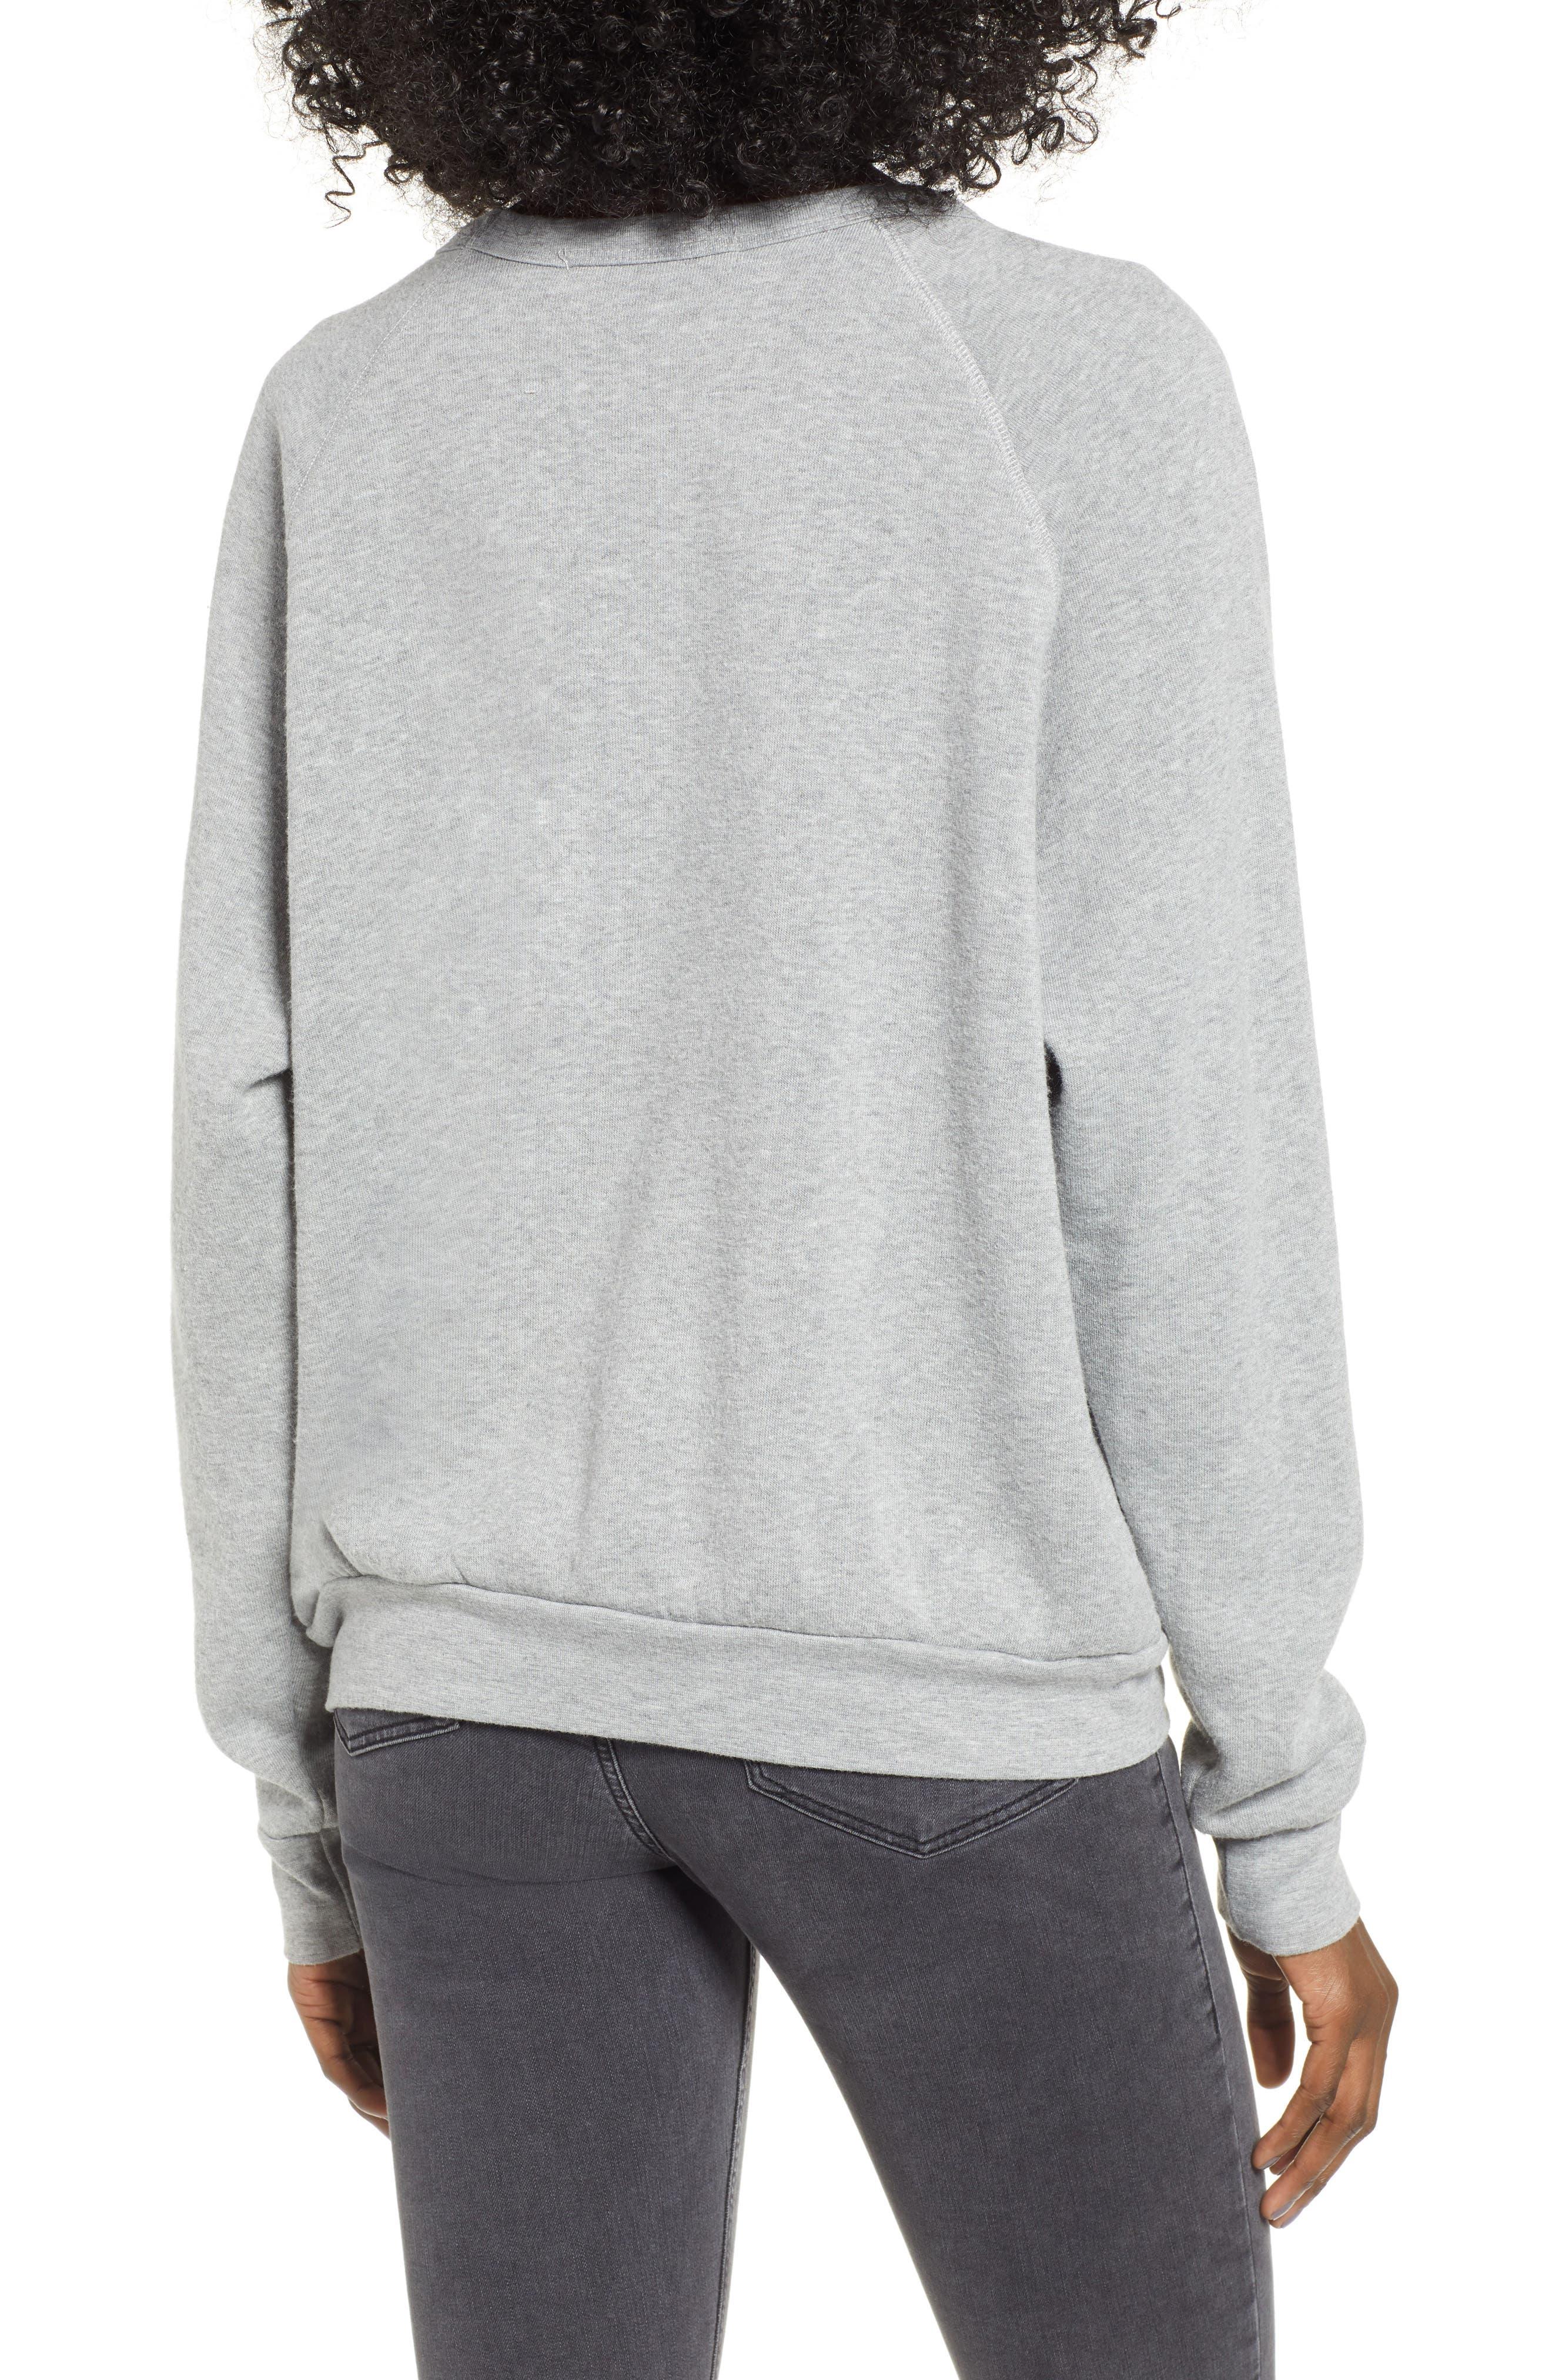 Naughty/Nice Reversible Sweatshirt,                             Alternate thumbnail 3, color,                             HEATHER GREY